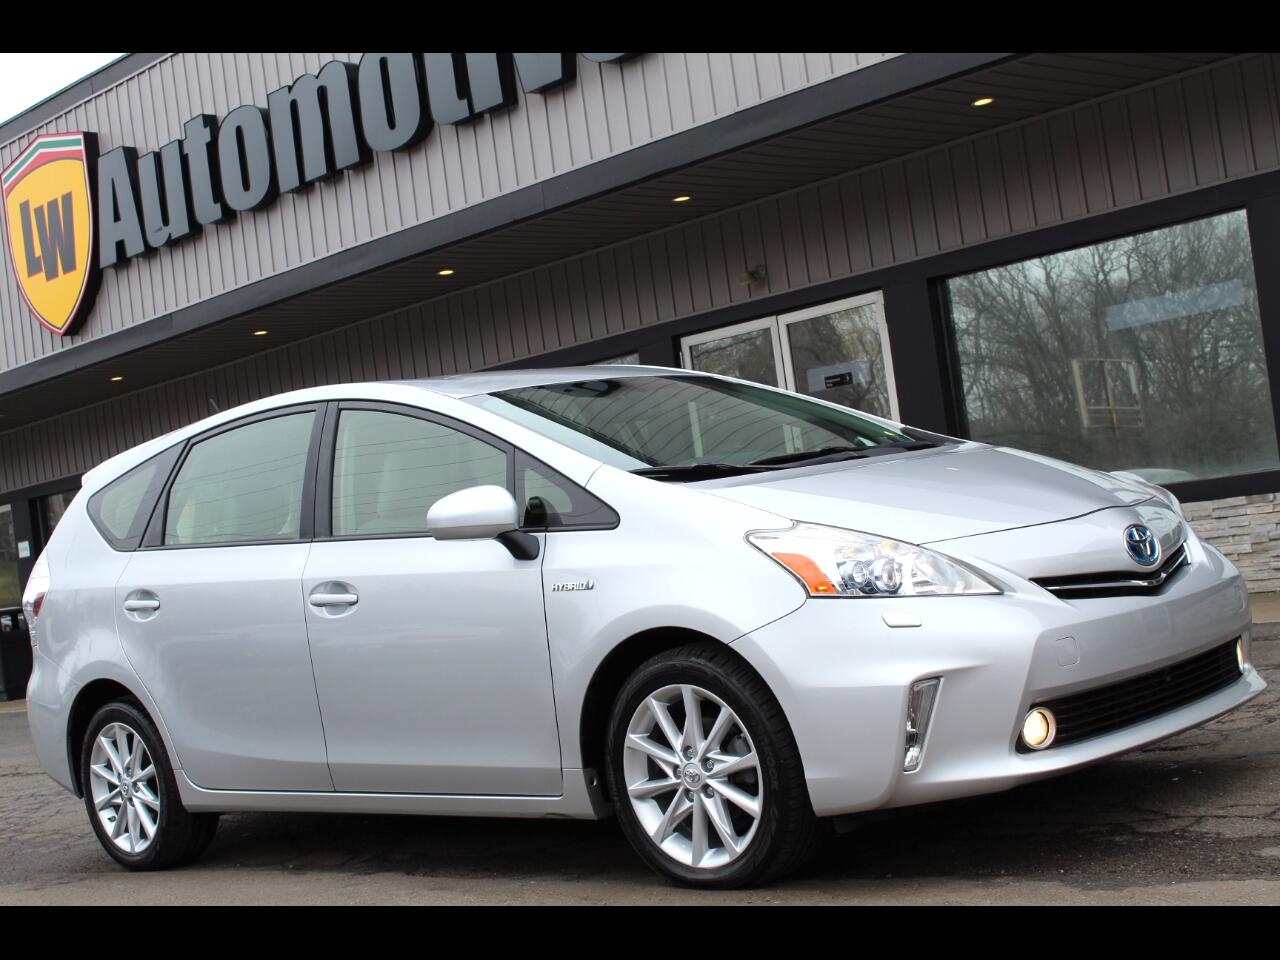 Toyota Prius V 5dr Wgn Five (Natl) 2013